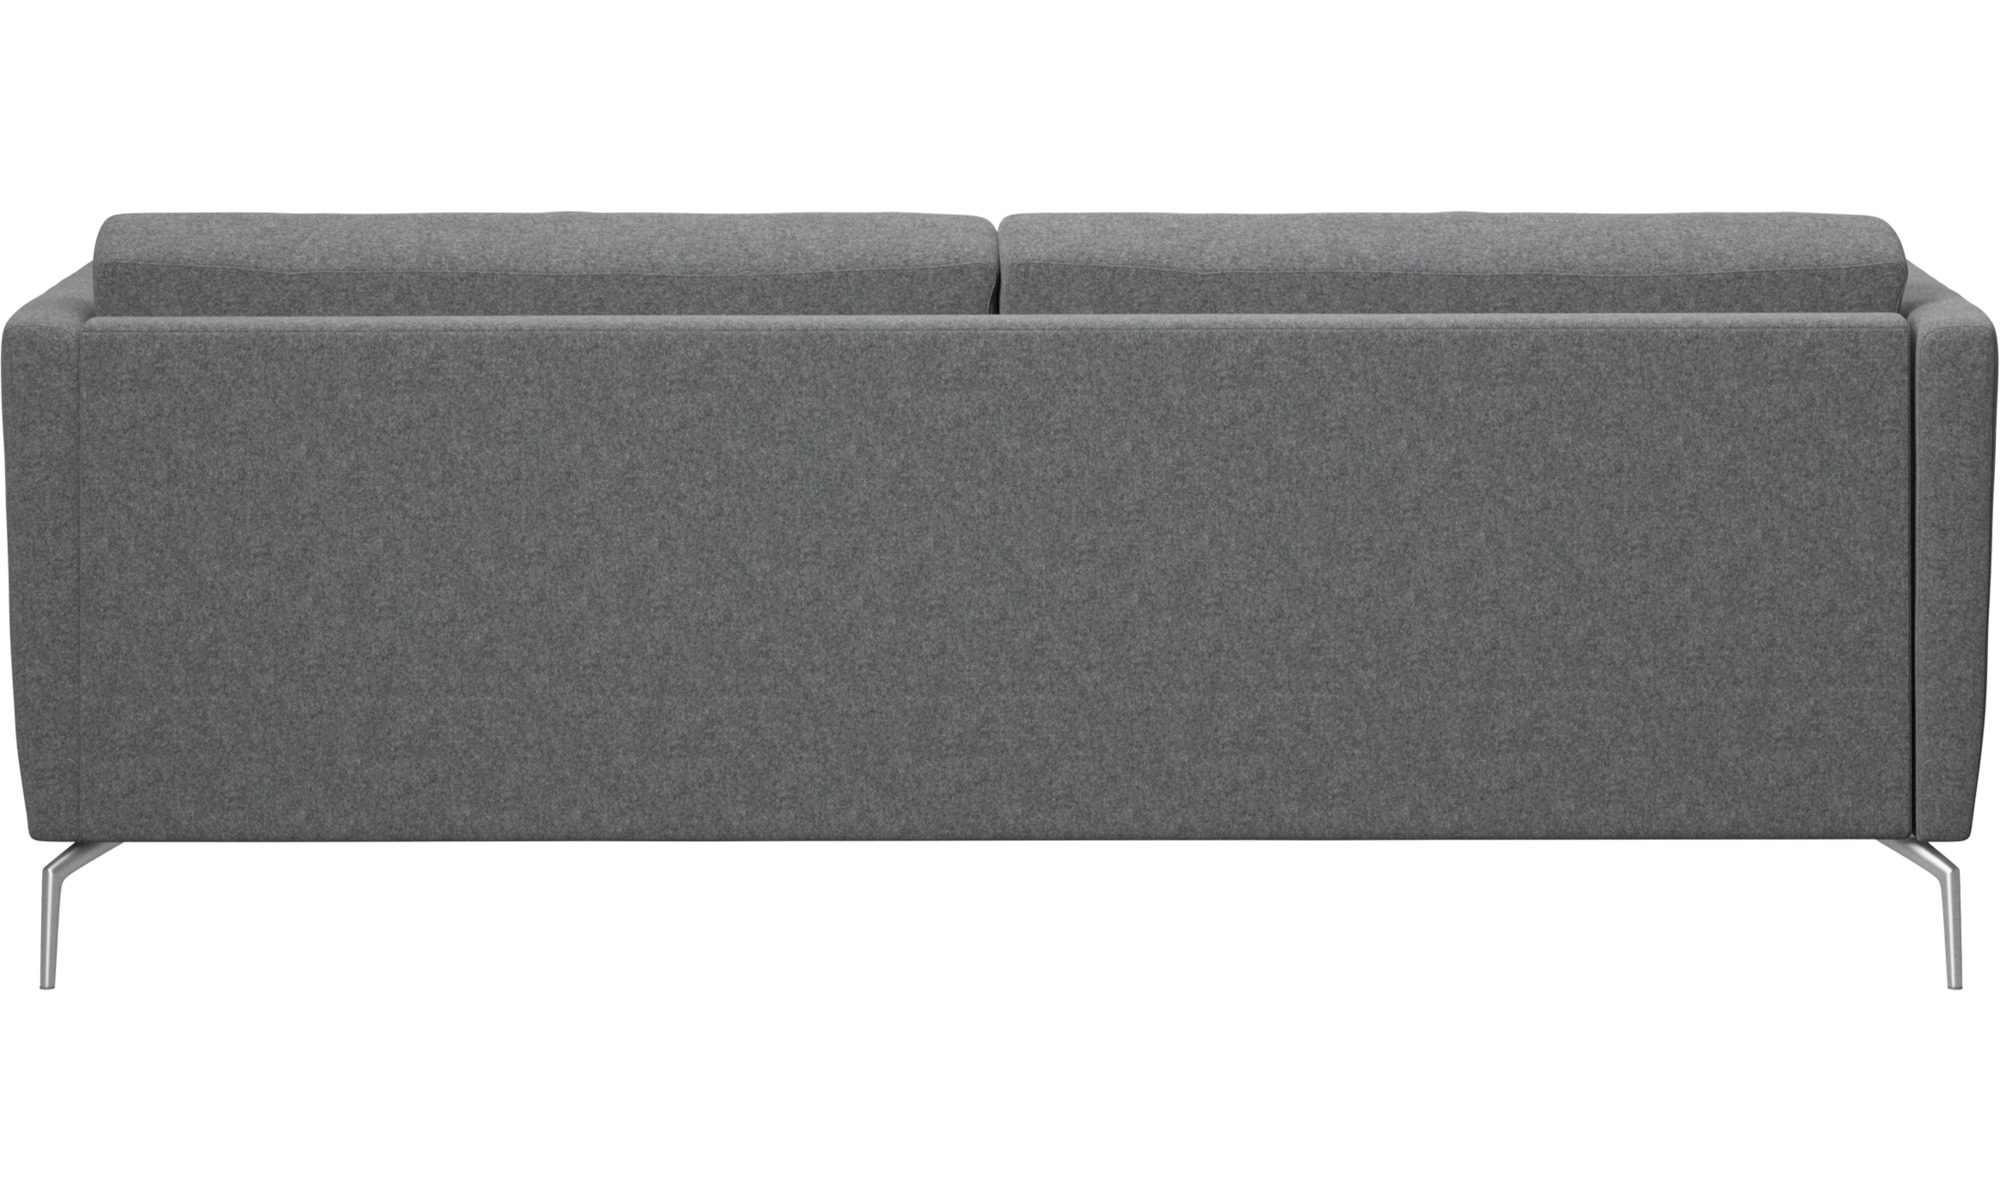 Beau 2.5 Seater Sofas   Osaka Sofa, Regular Seat   Grey   Fabric